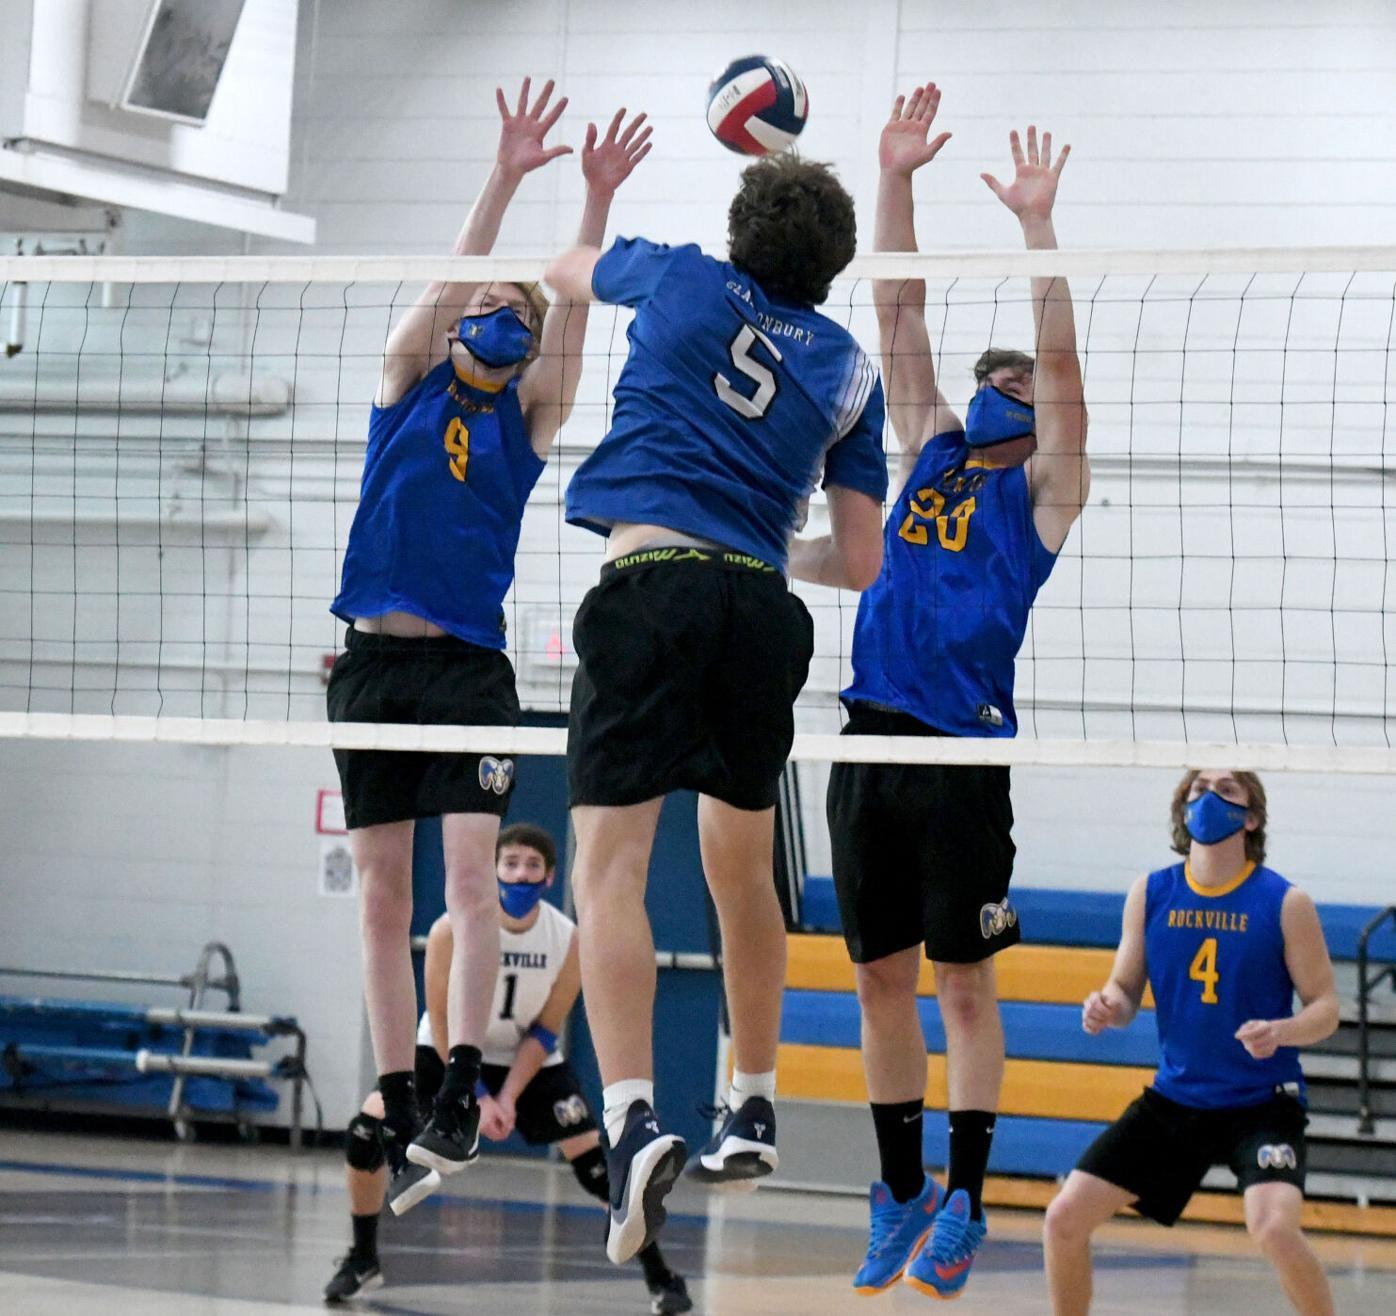 050421 Volleyball 01.jpg